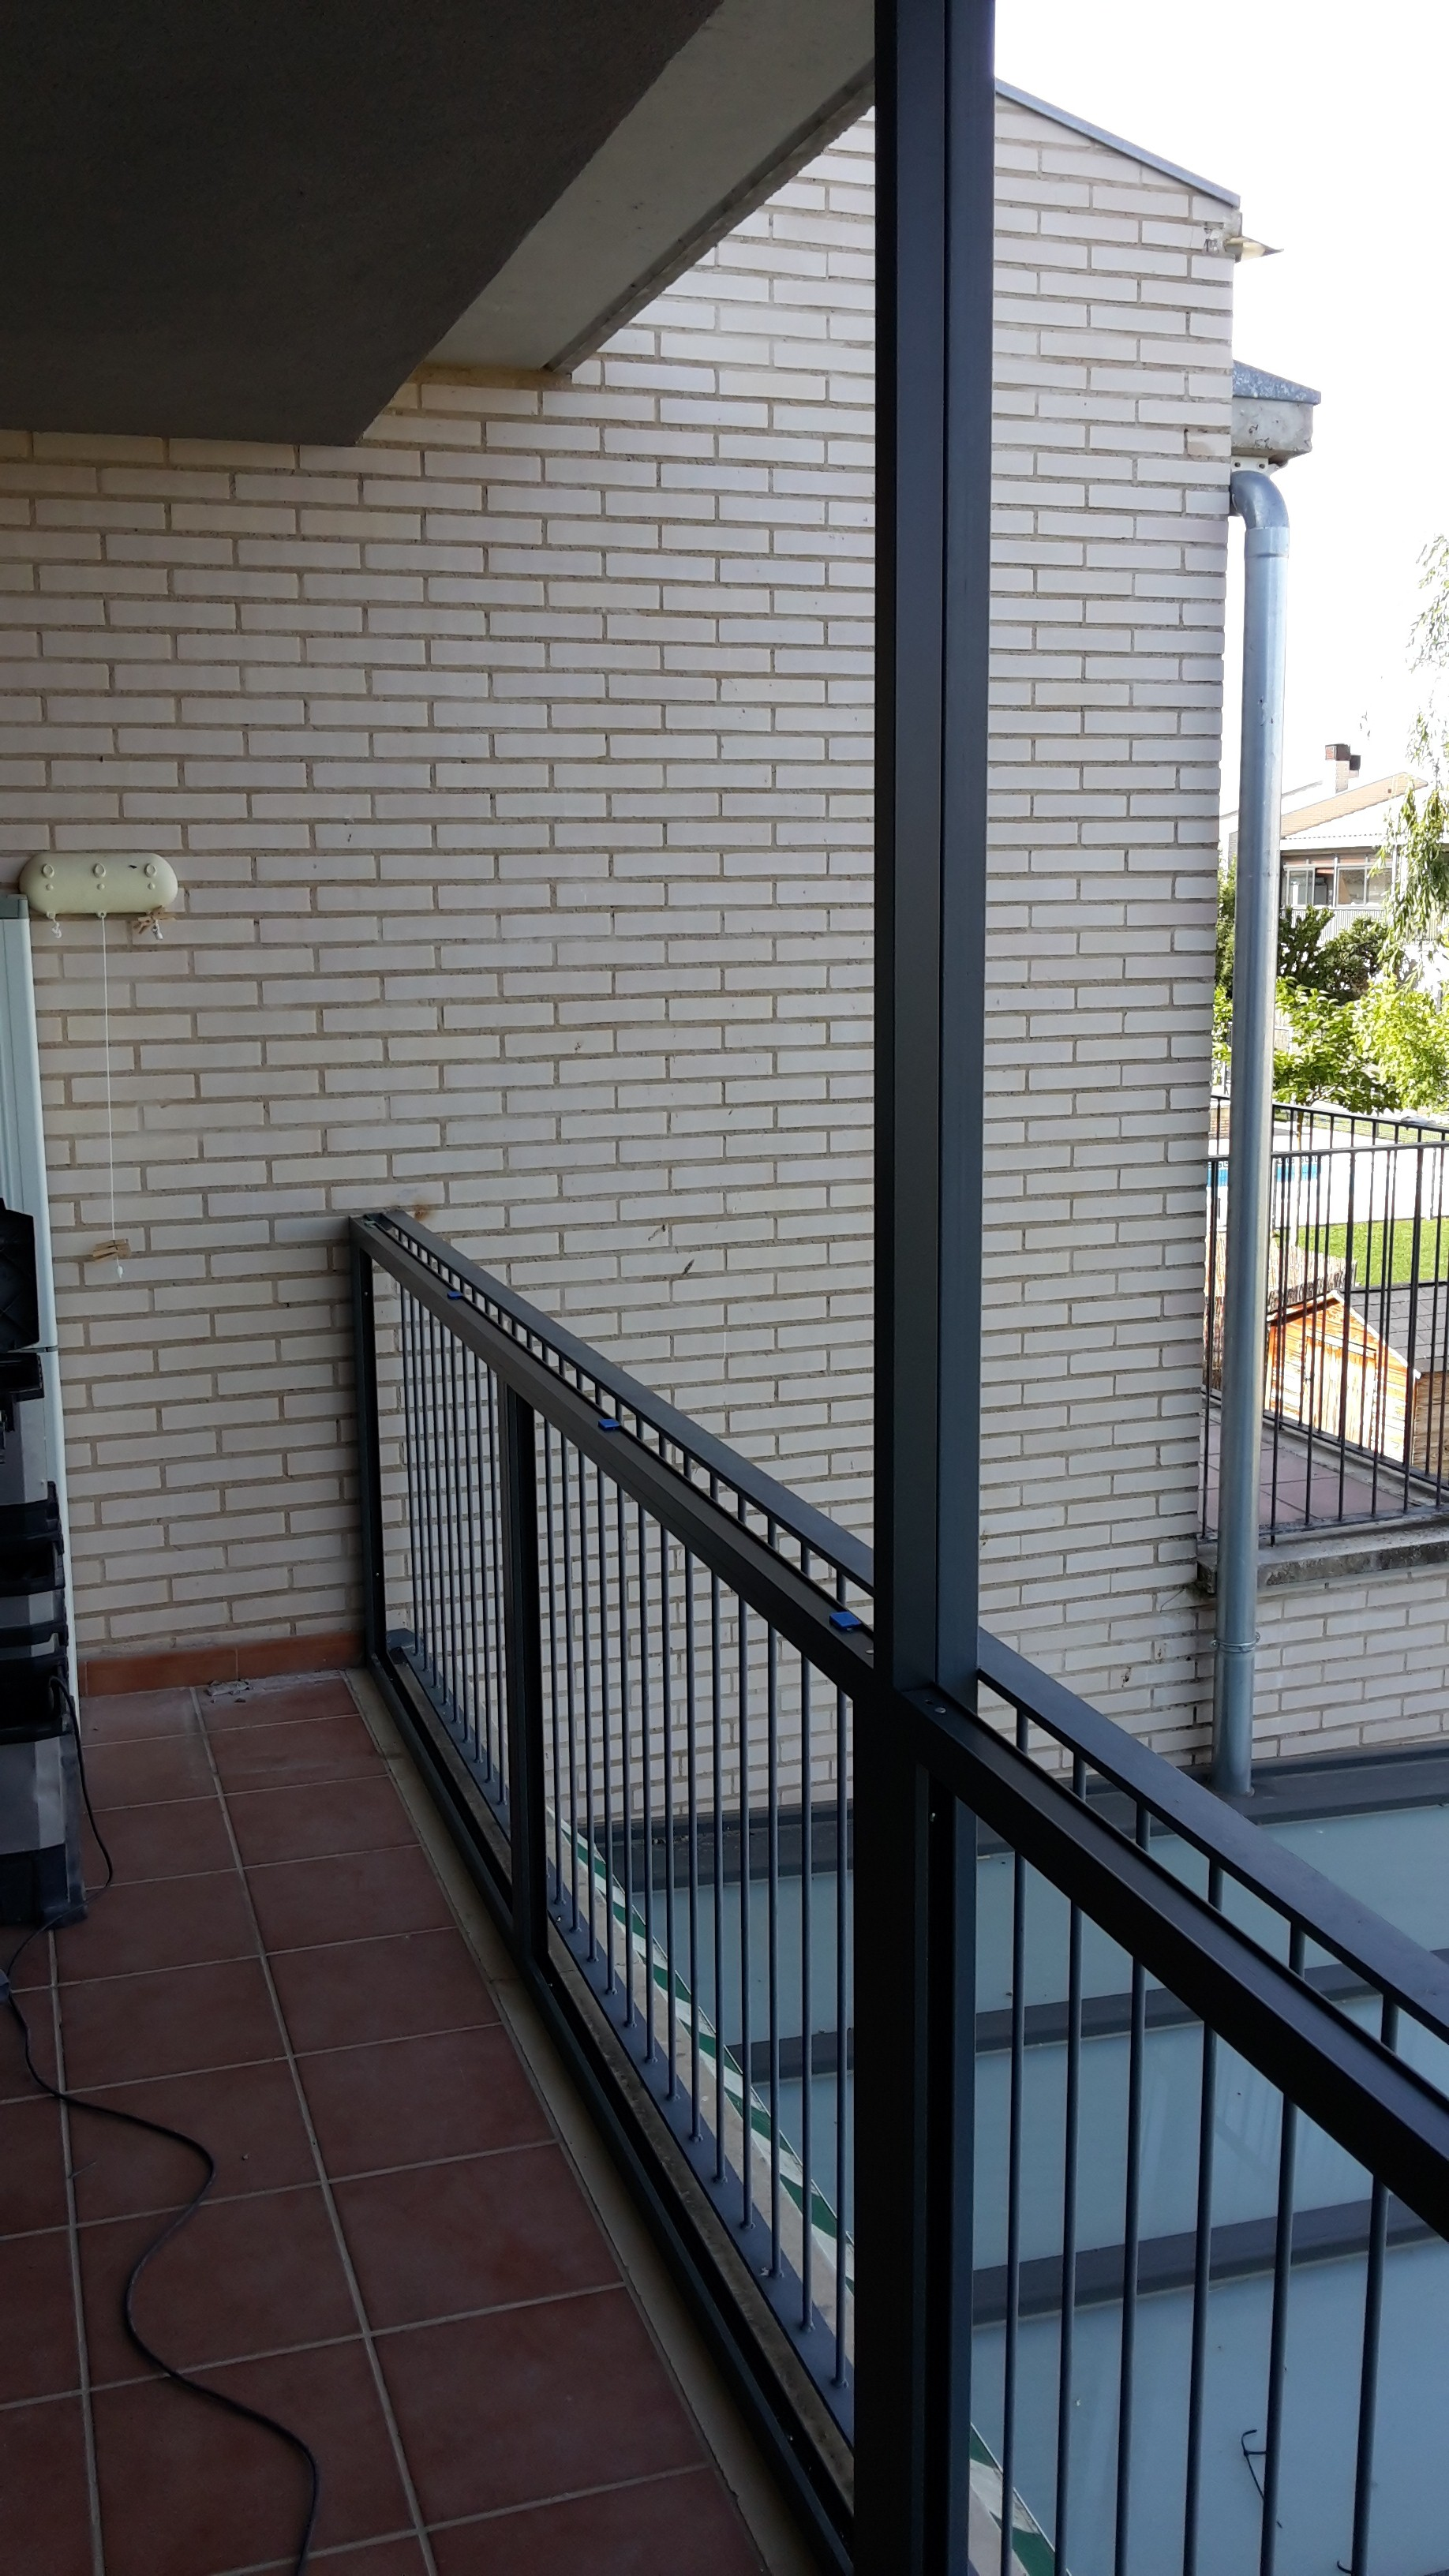 Montaje de ventanas de aluminio archivos montajes de for Carpinteria aluminio